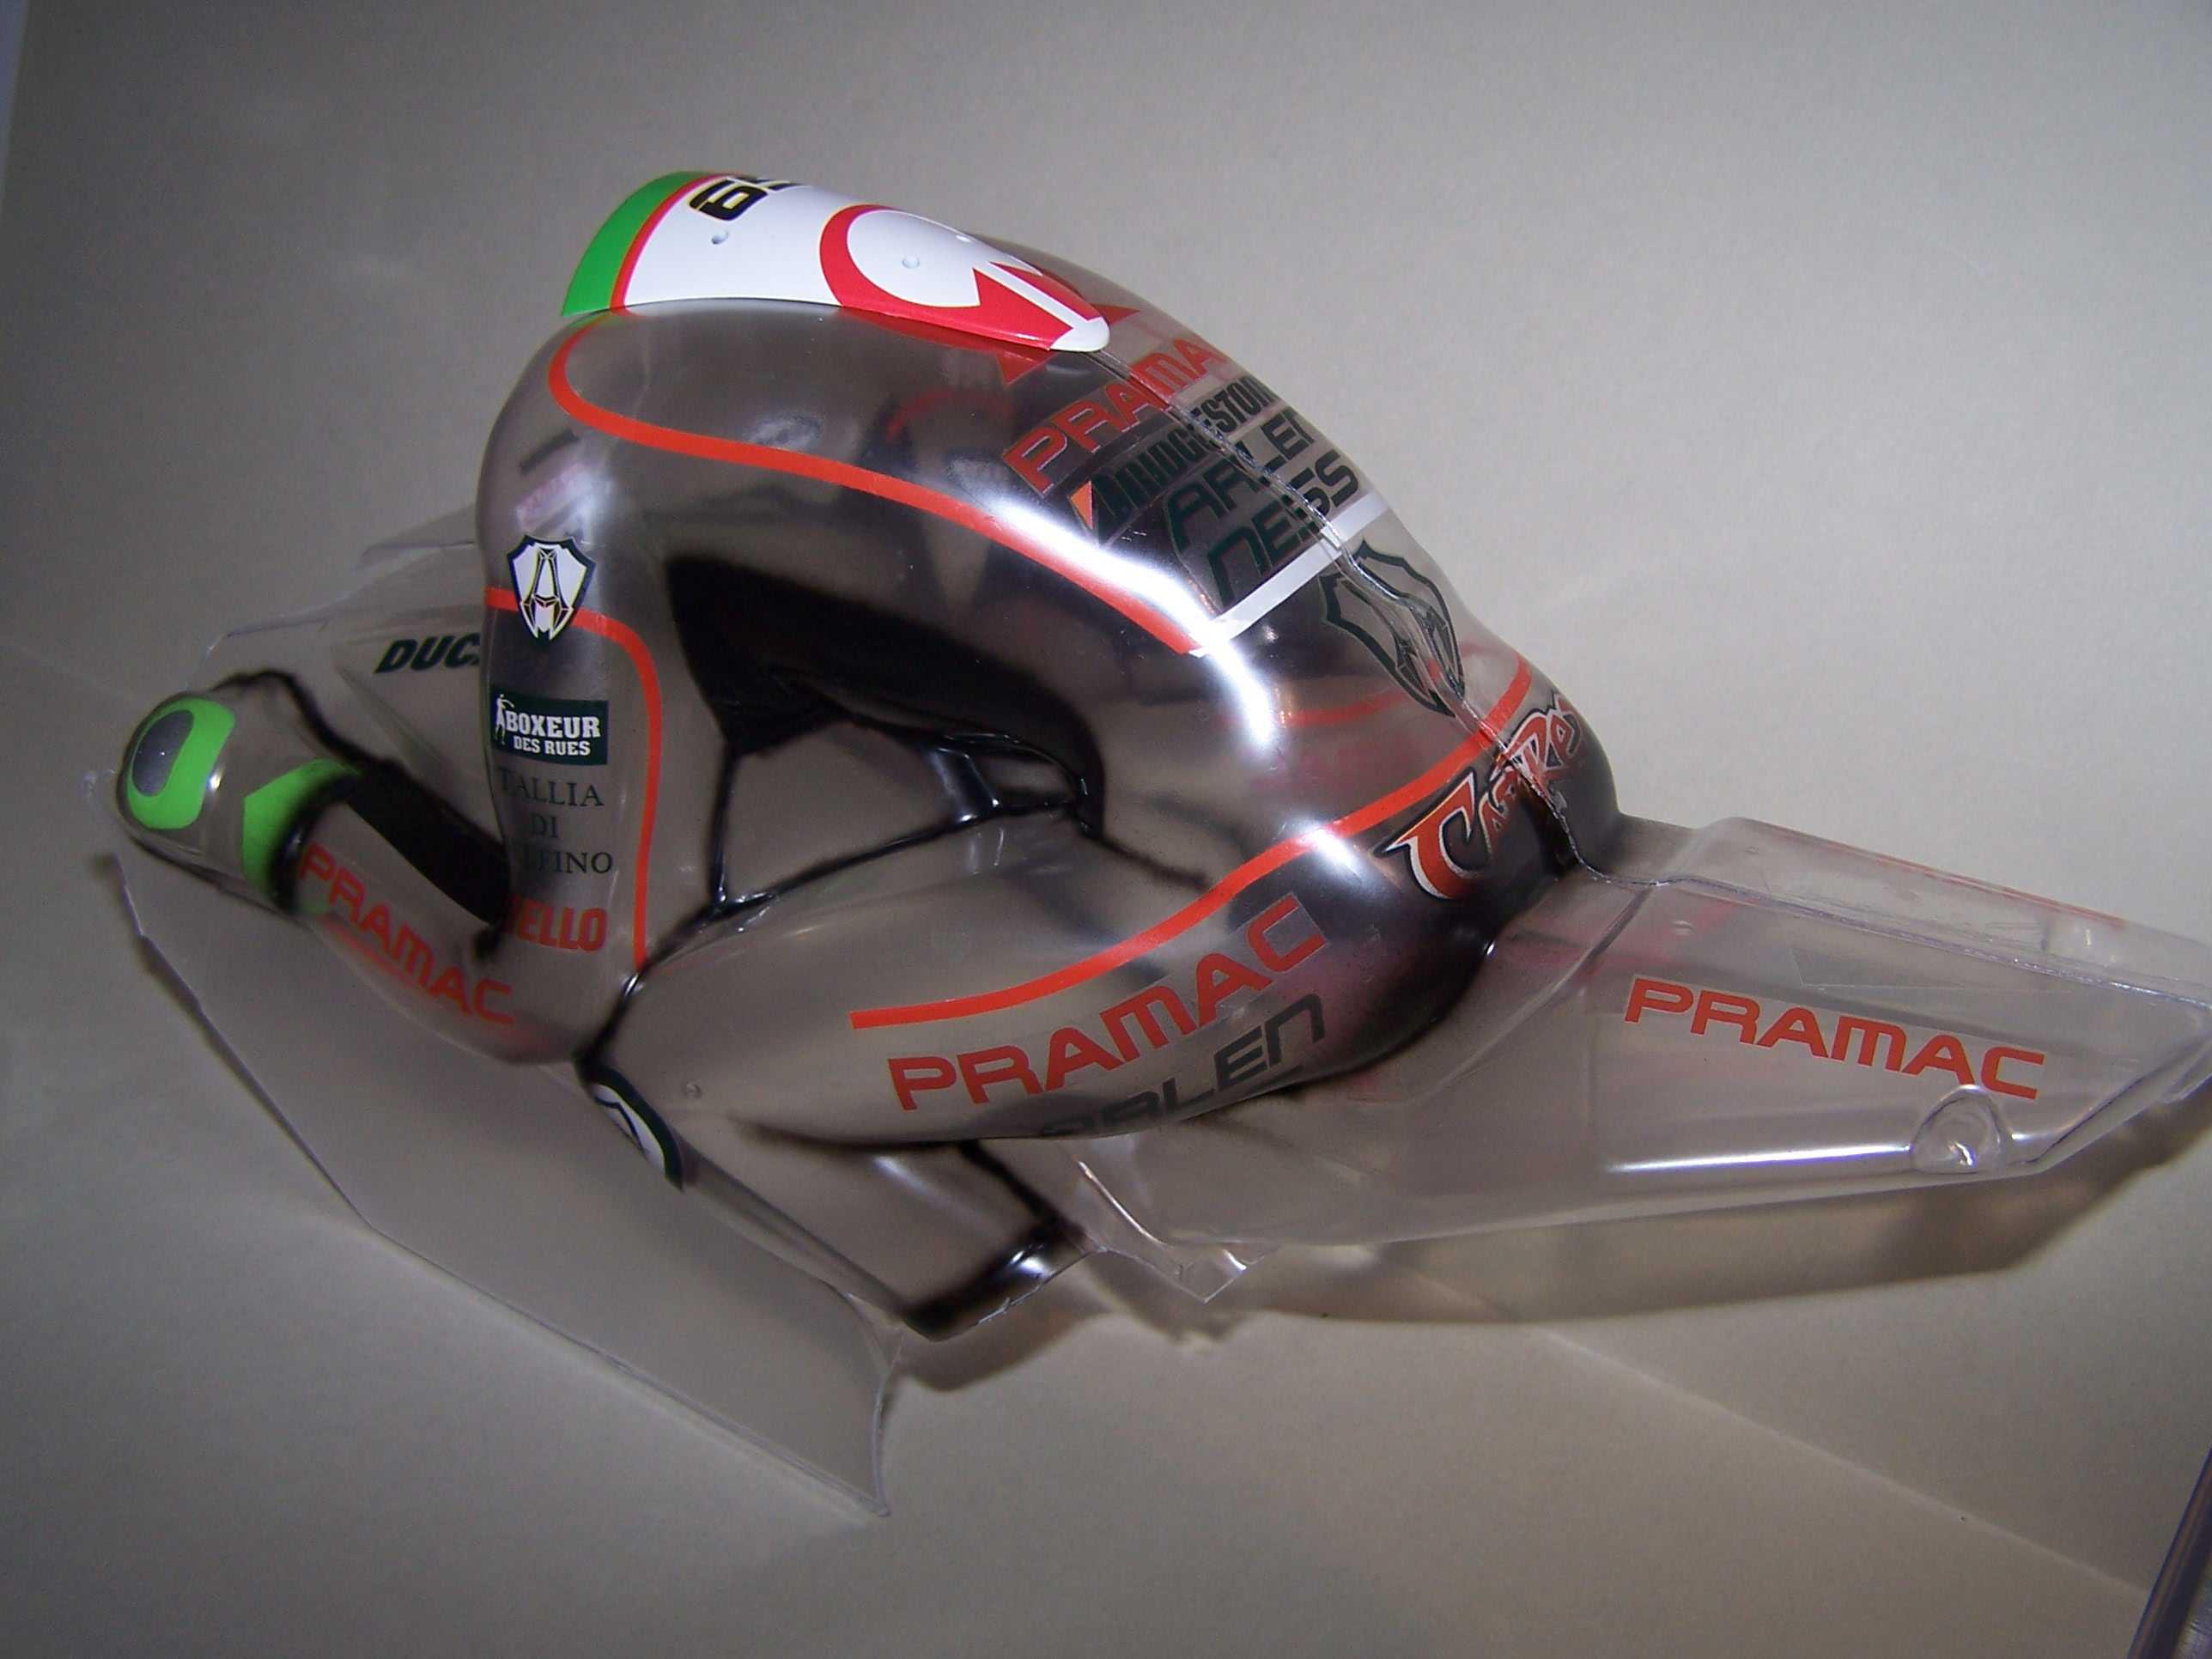 [Pramac-Ducati-Step-6.1.jpg]